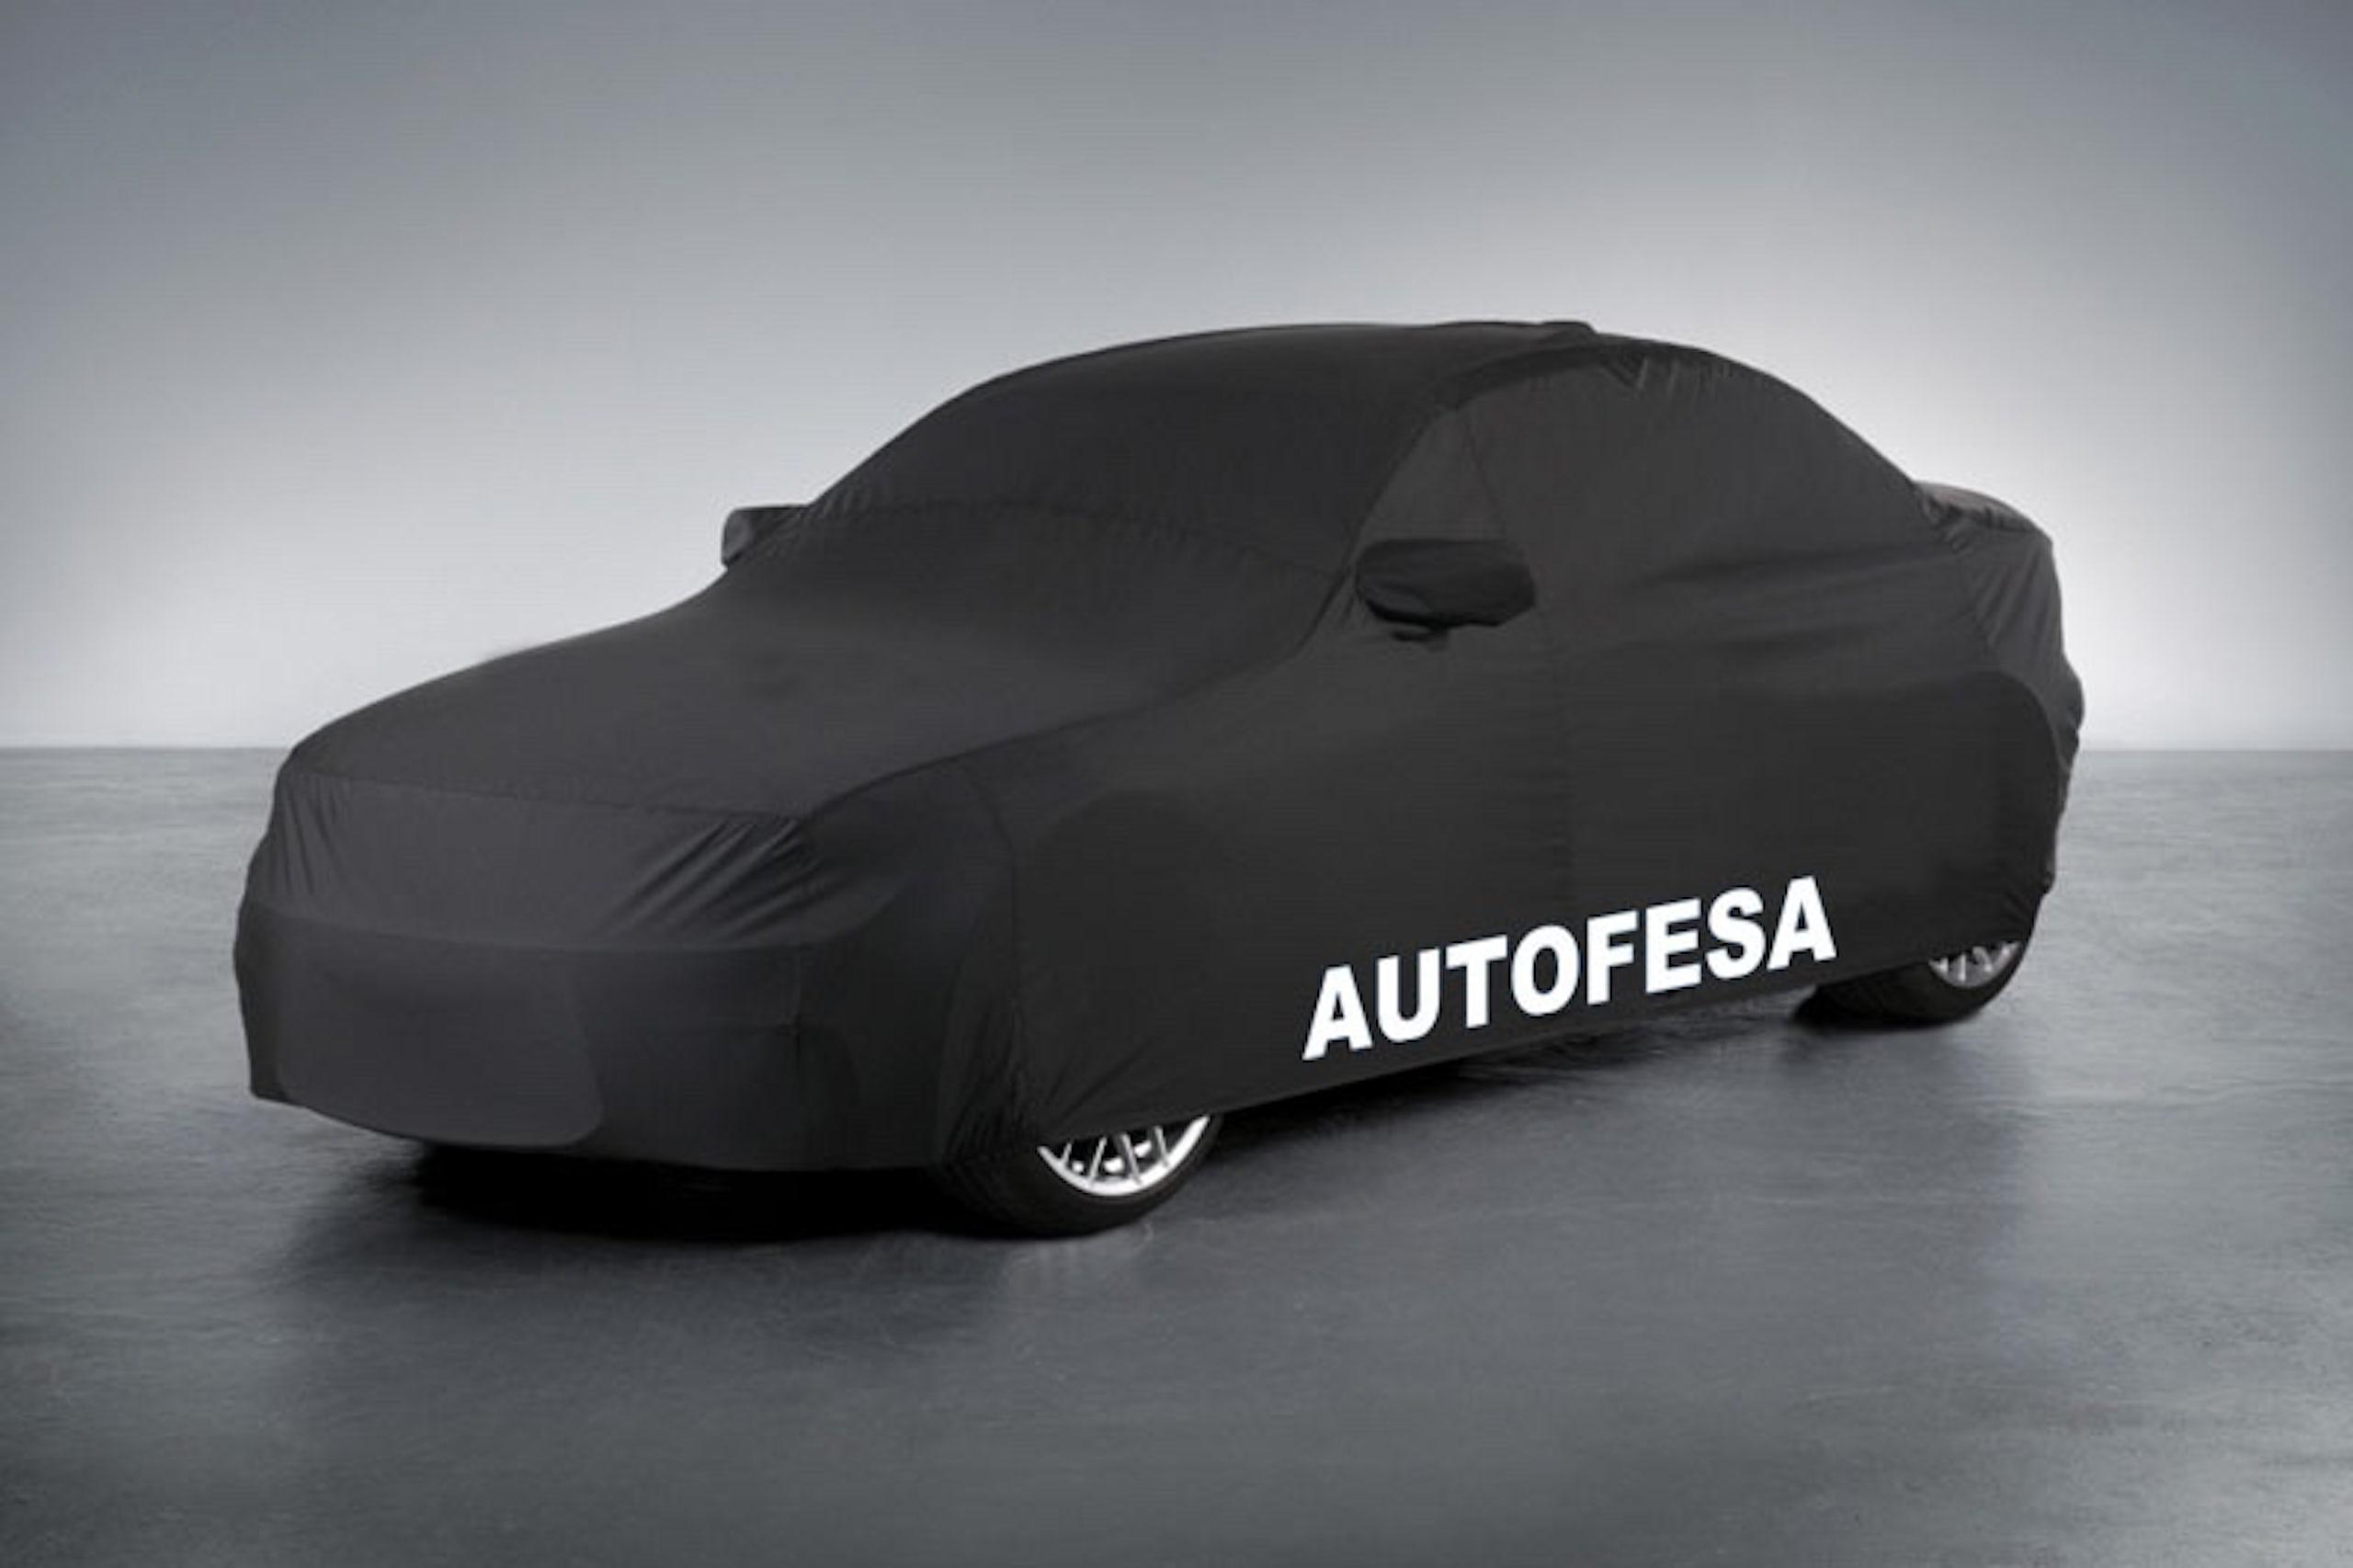 Peugeot Rcz 2.0 HDi 163cv Asphalt 2p FAP - Foto 23